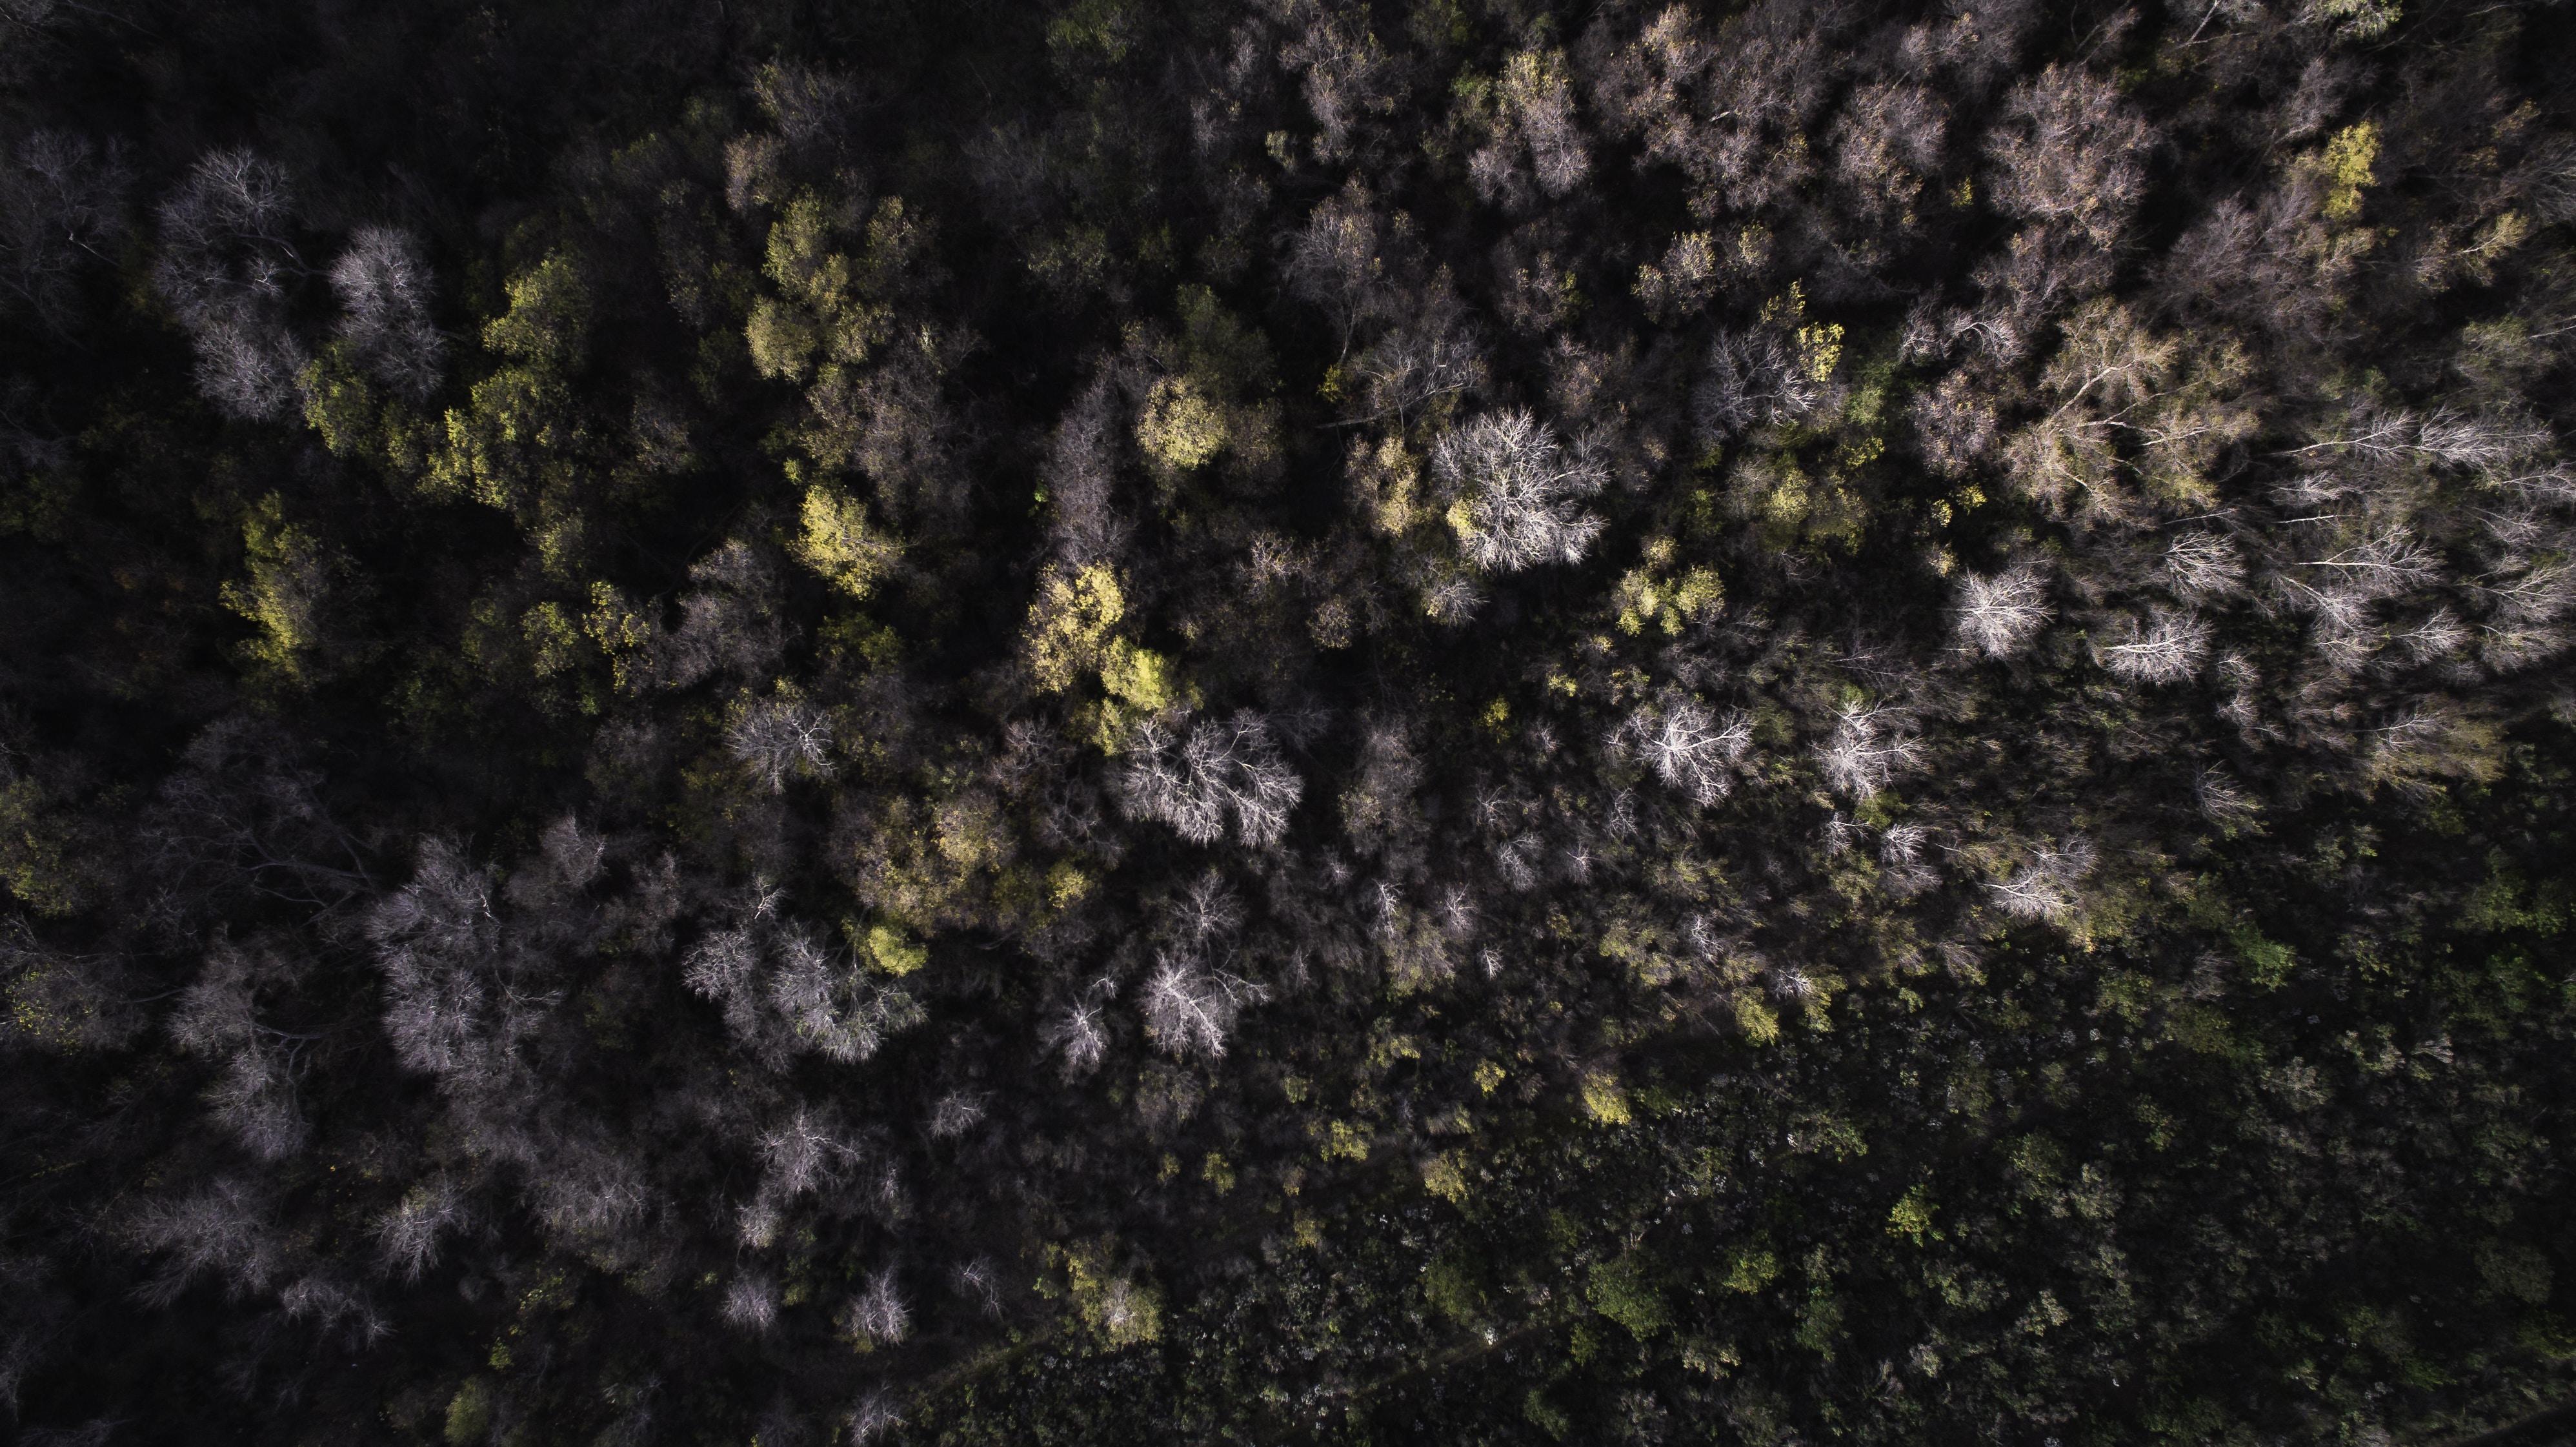 A drone shot of a stretch of dead trees in Vista, California